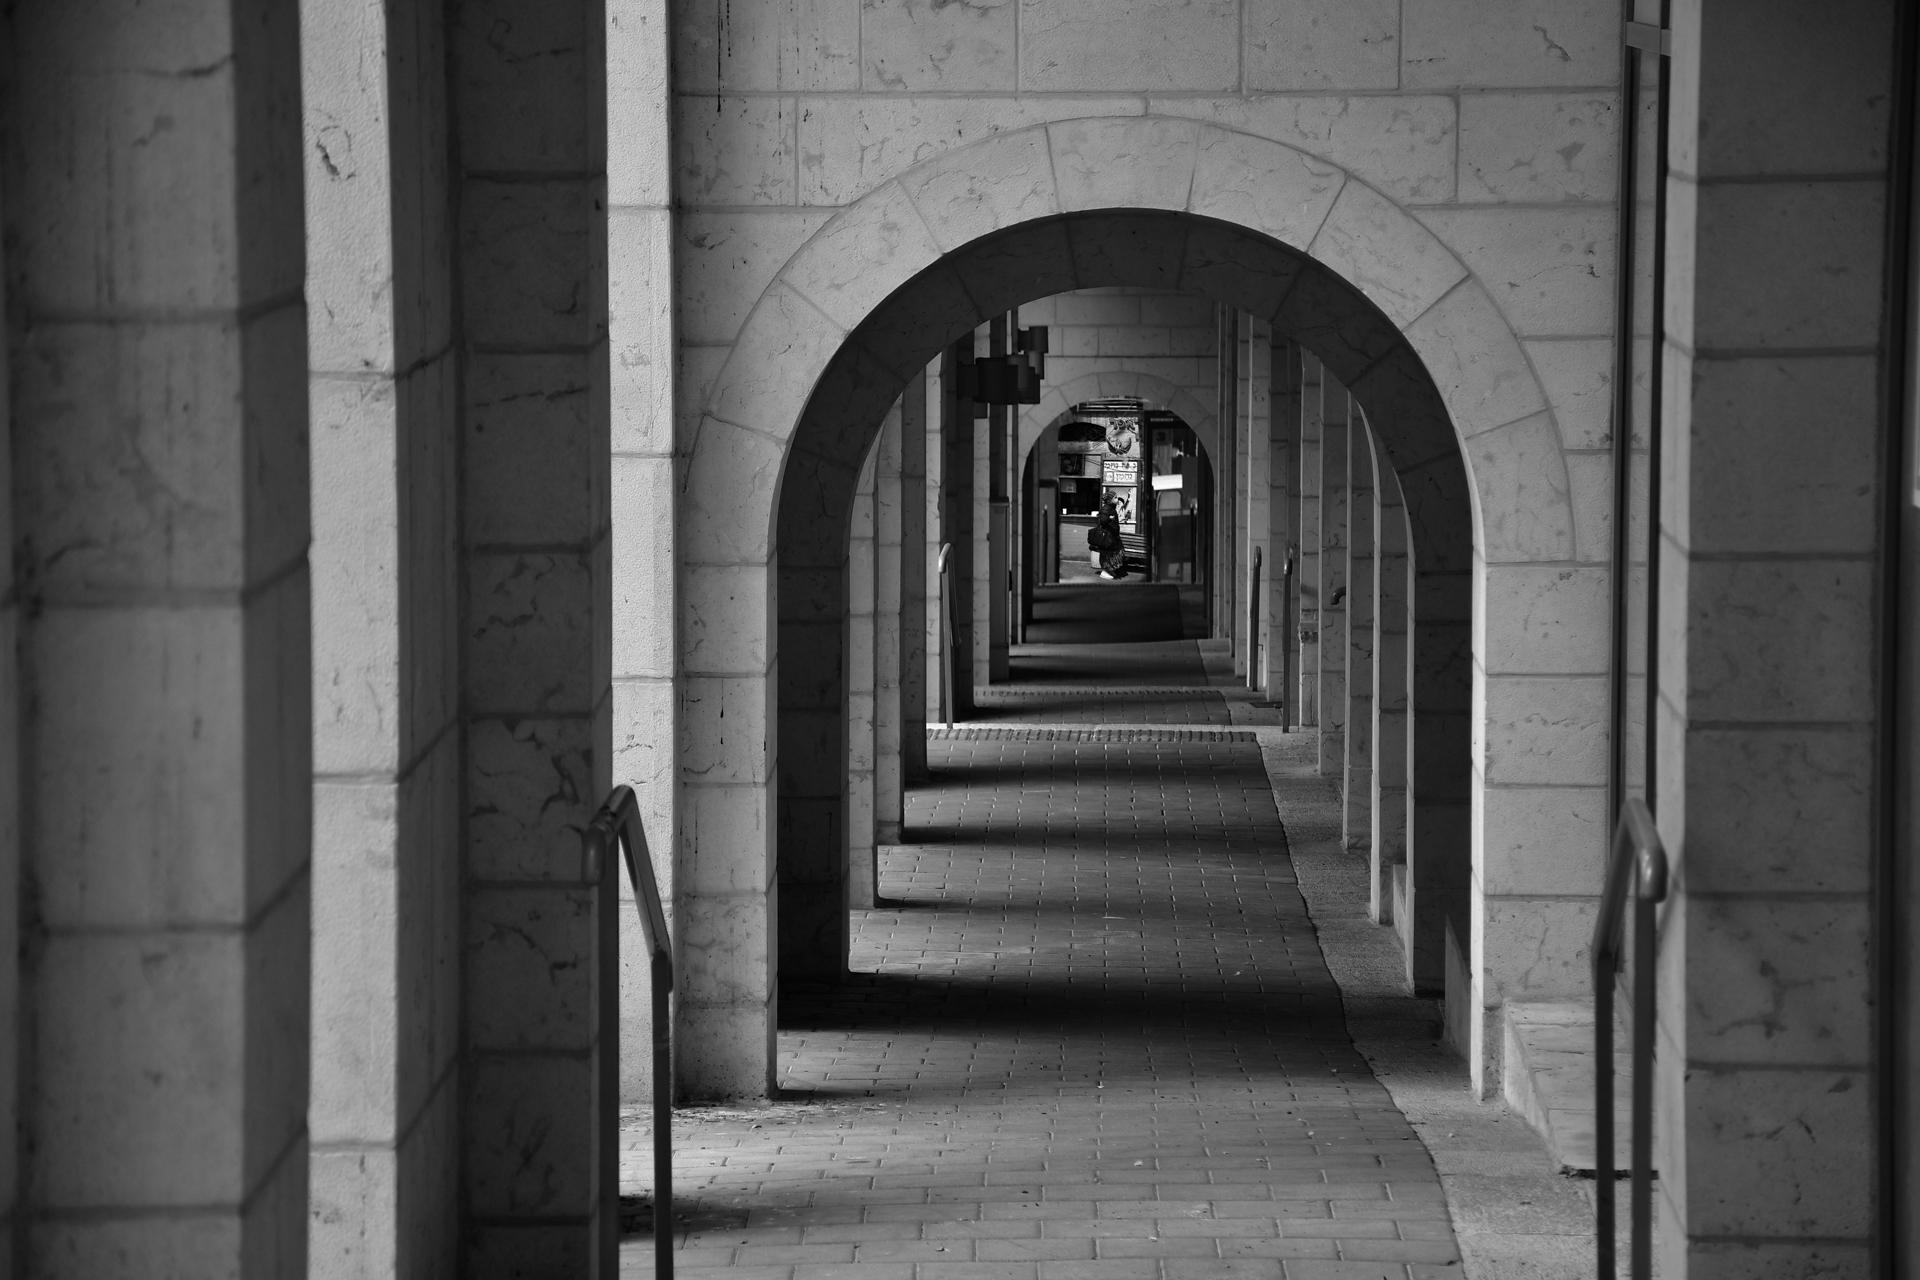 https://www.y-adama.co.il/blog/through-the-arches-of-jerusalem